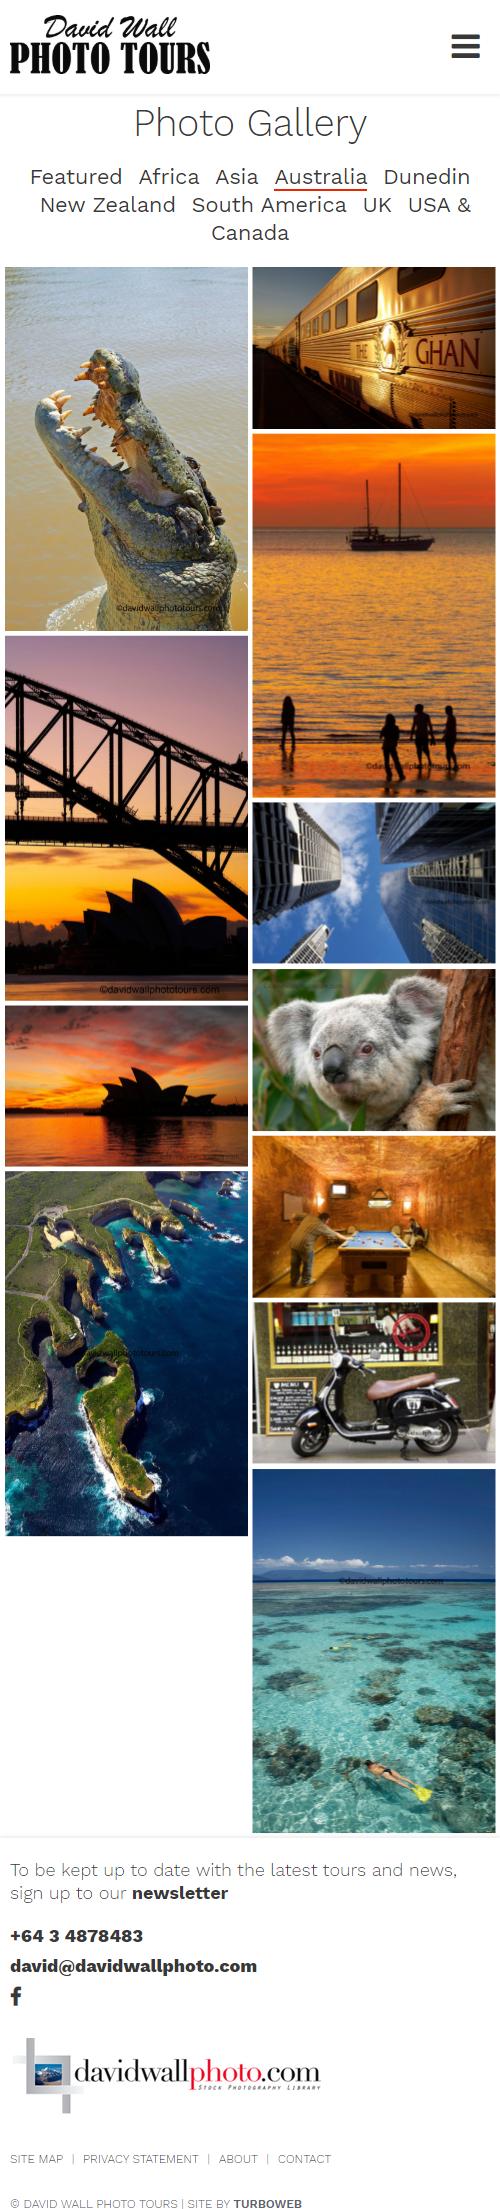 Mosaic image gallery by Turboweb screenshot